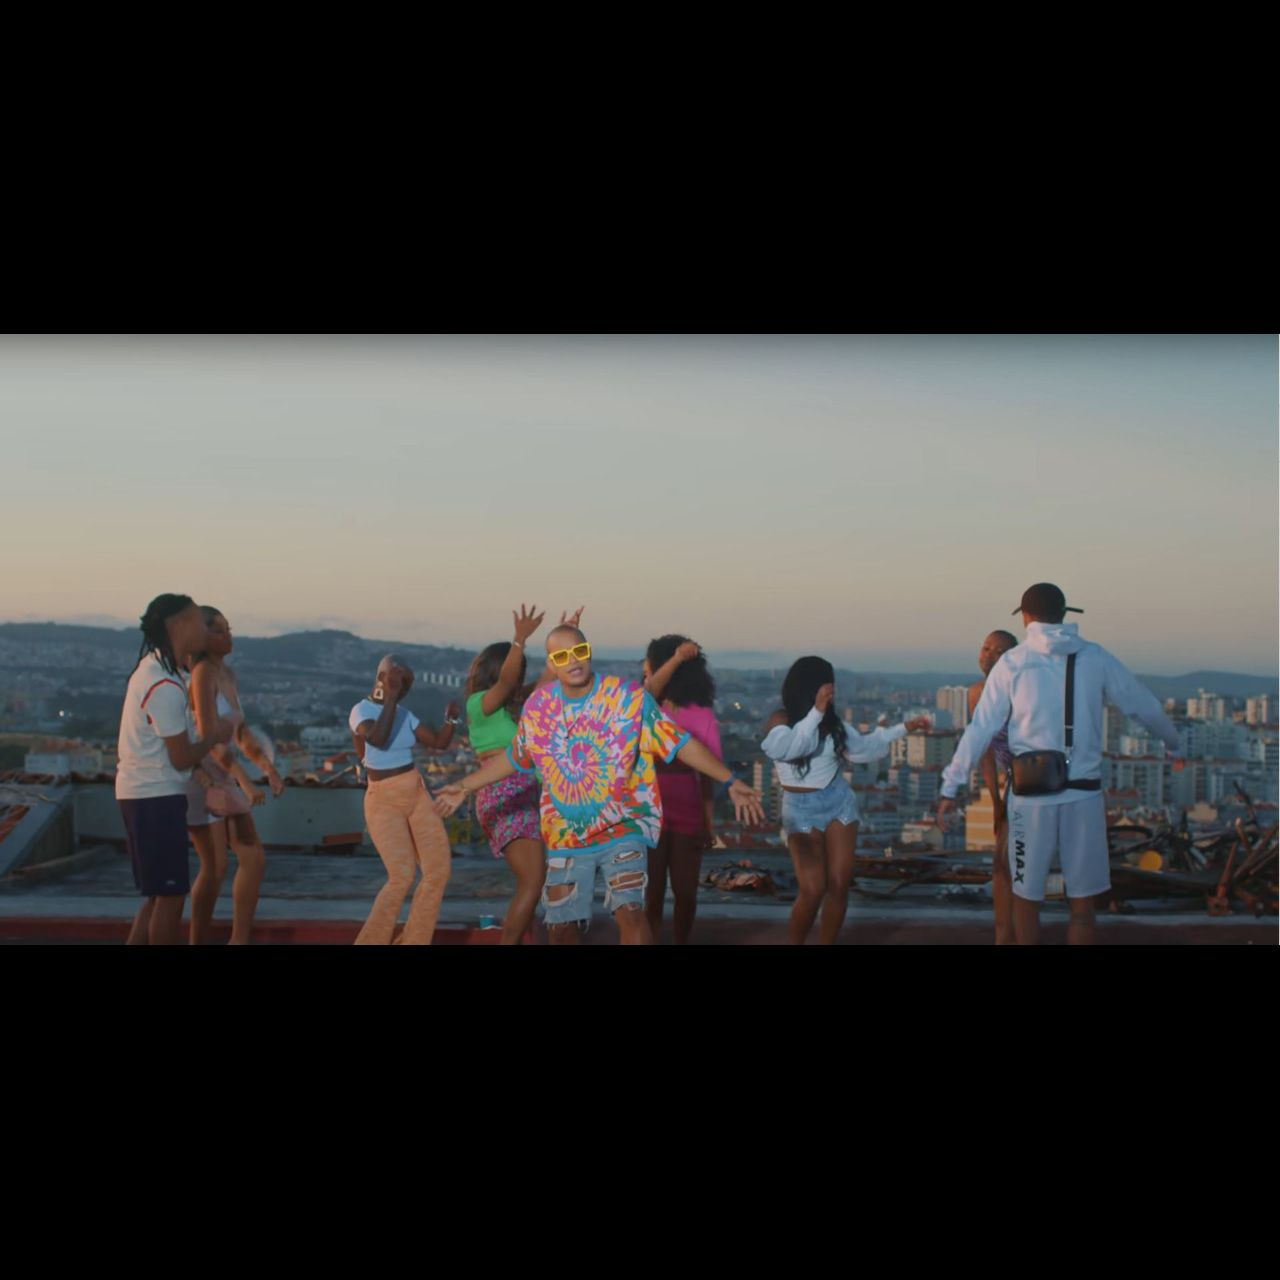 Djodje - Sima Nkre (ft. Deejay Telio and Julinho KSD) (Thumbnail)